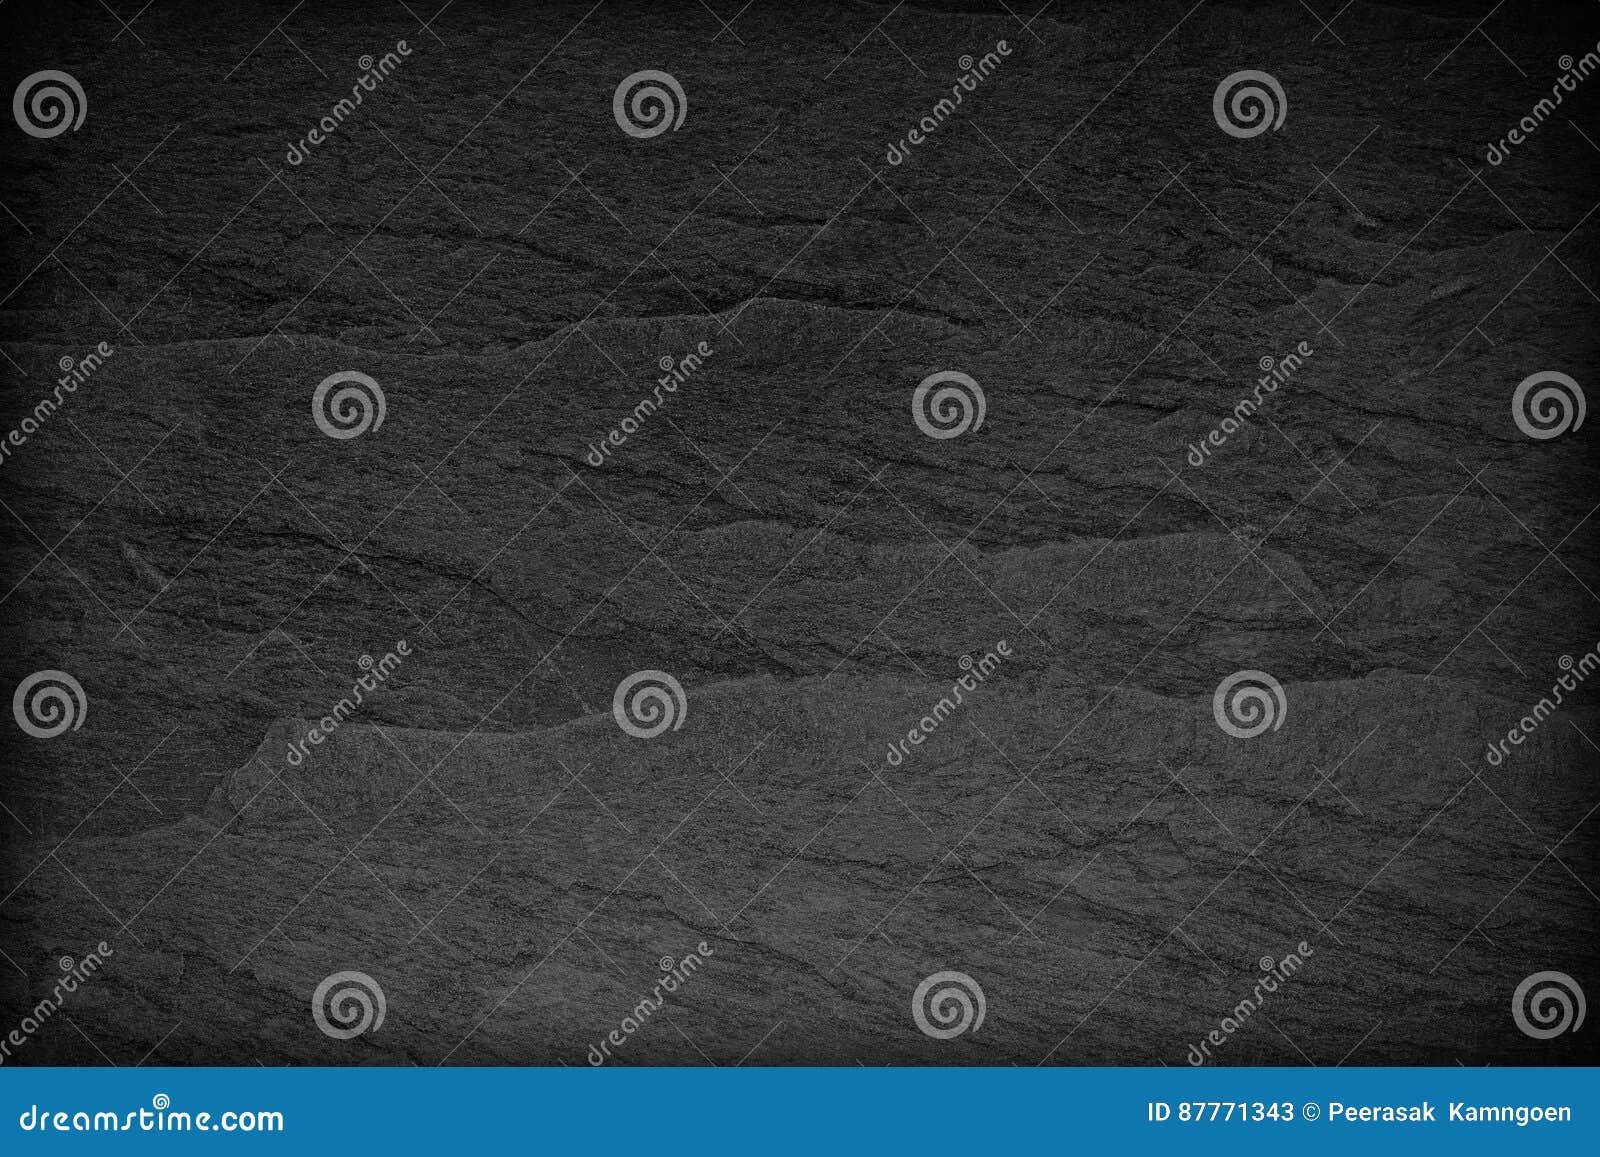 gris hq fondo negro - photo #25